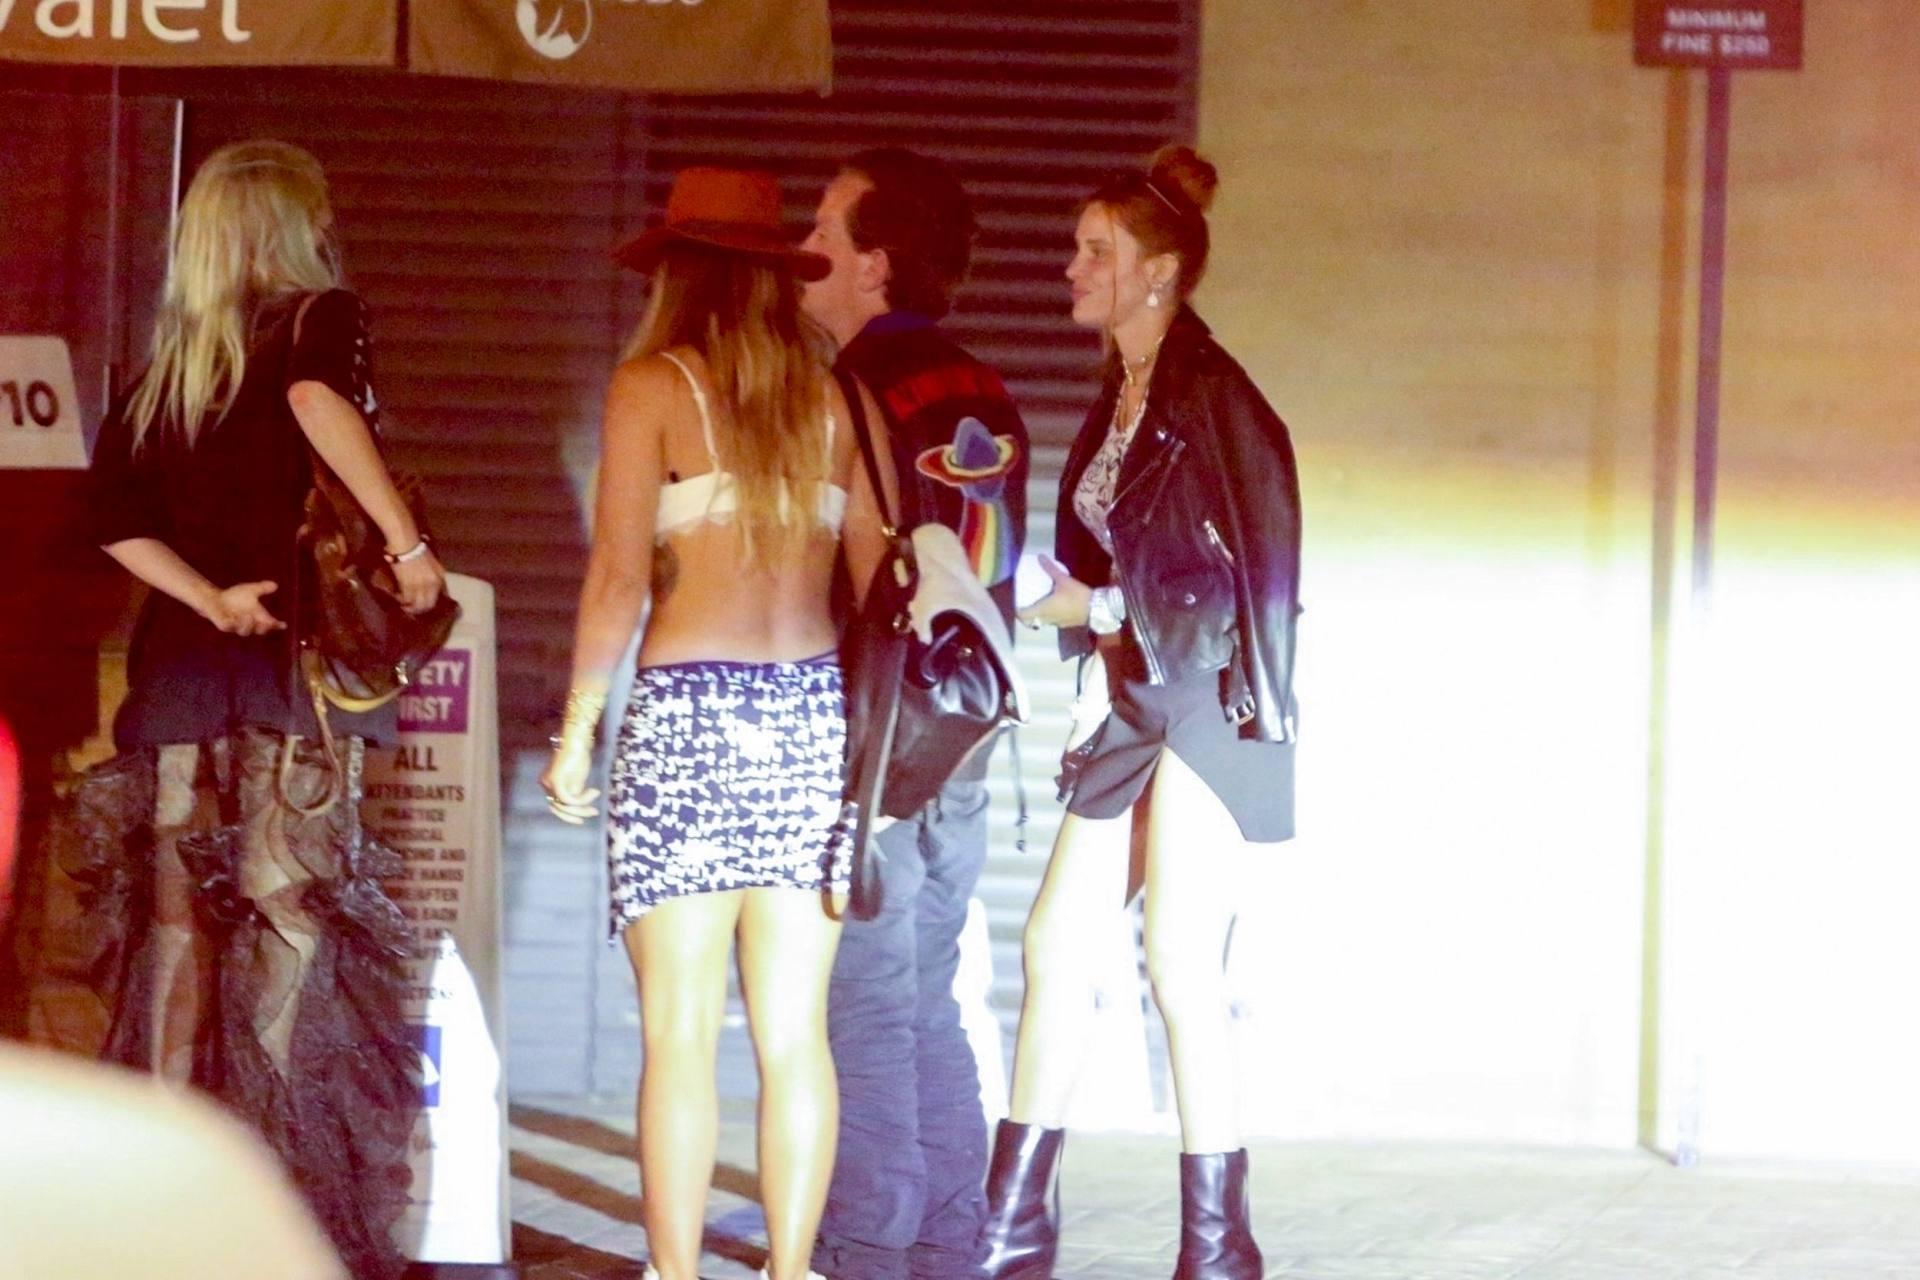 Bella & Dani Thorne – Sexy Legs In Mini Skirts At Nobu In Malibu 0016